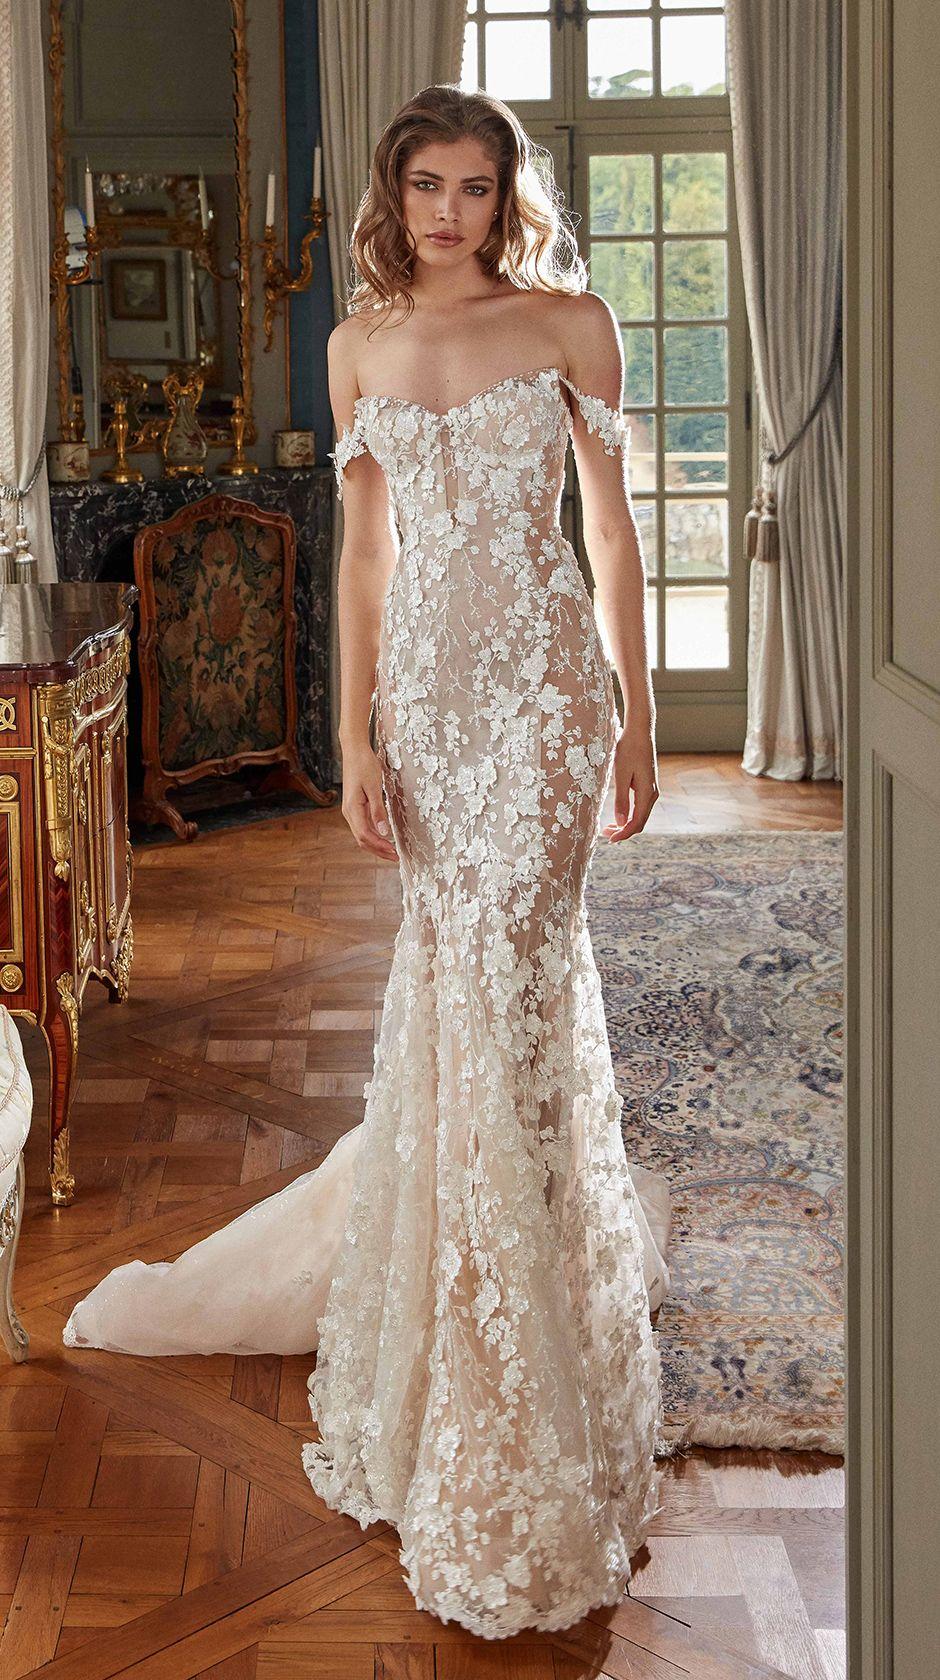 Maya Sheer Wedding Dress Galia Lahav Wedding Dress Petite Wedding Dress